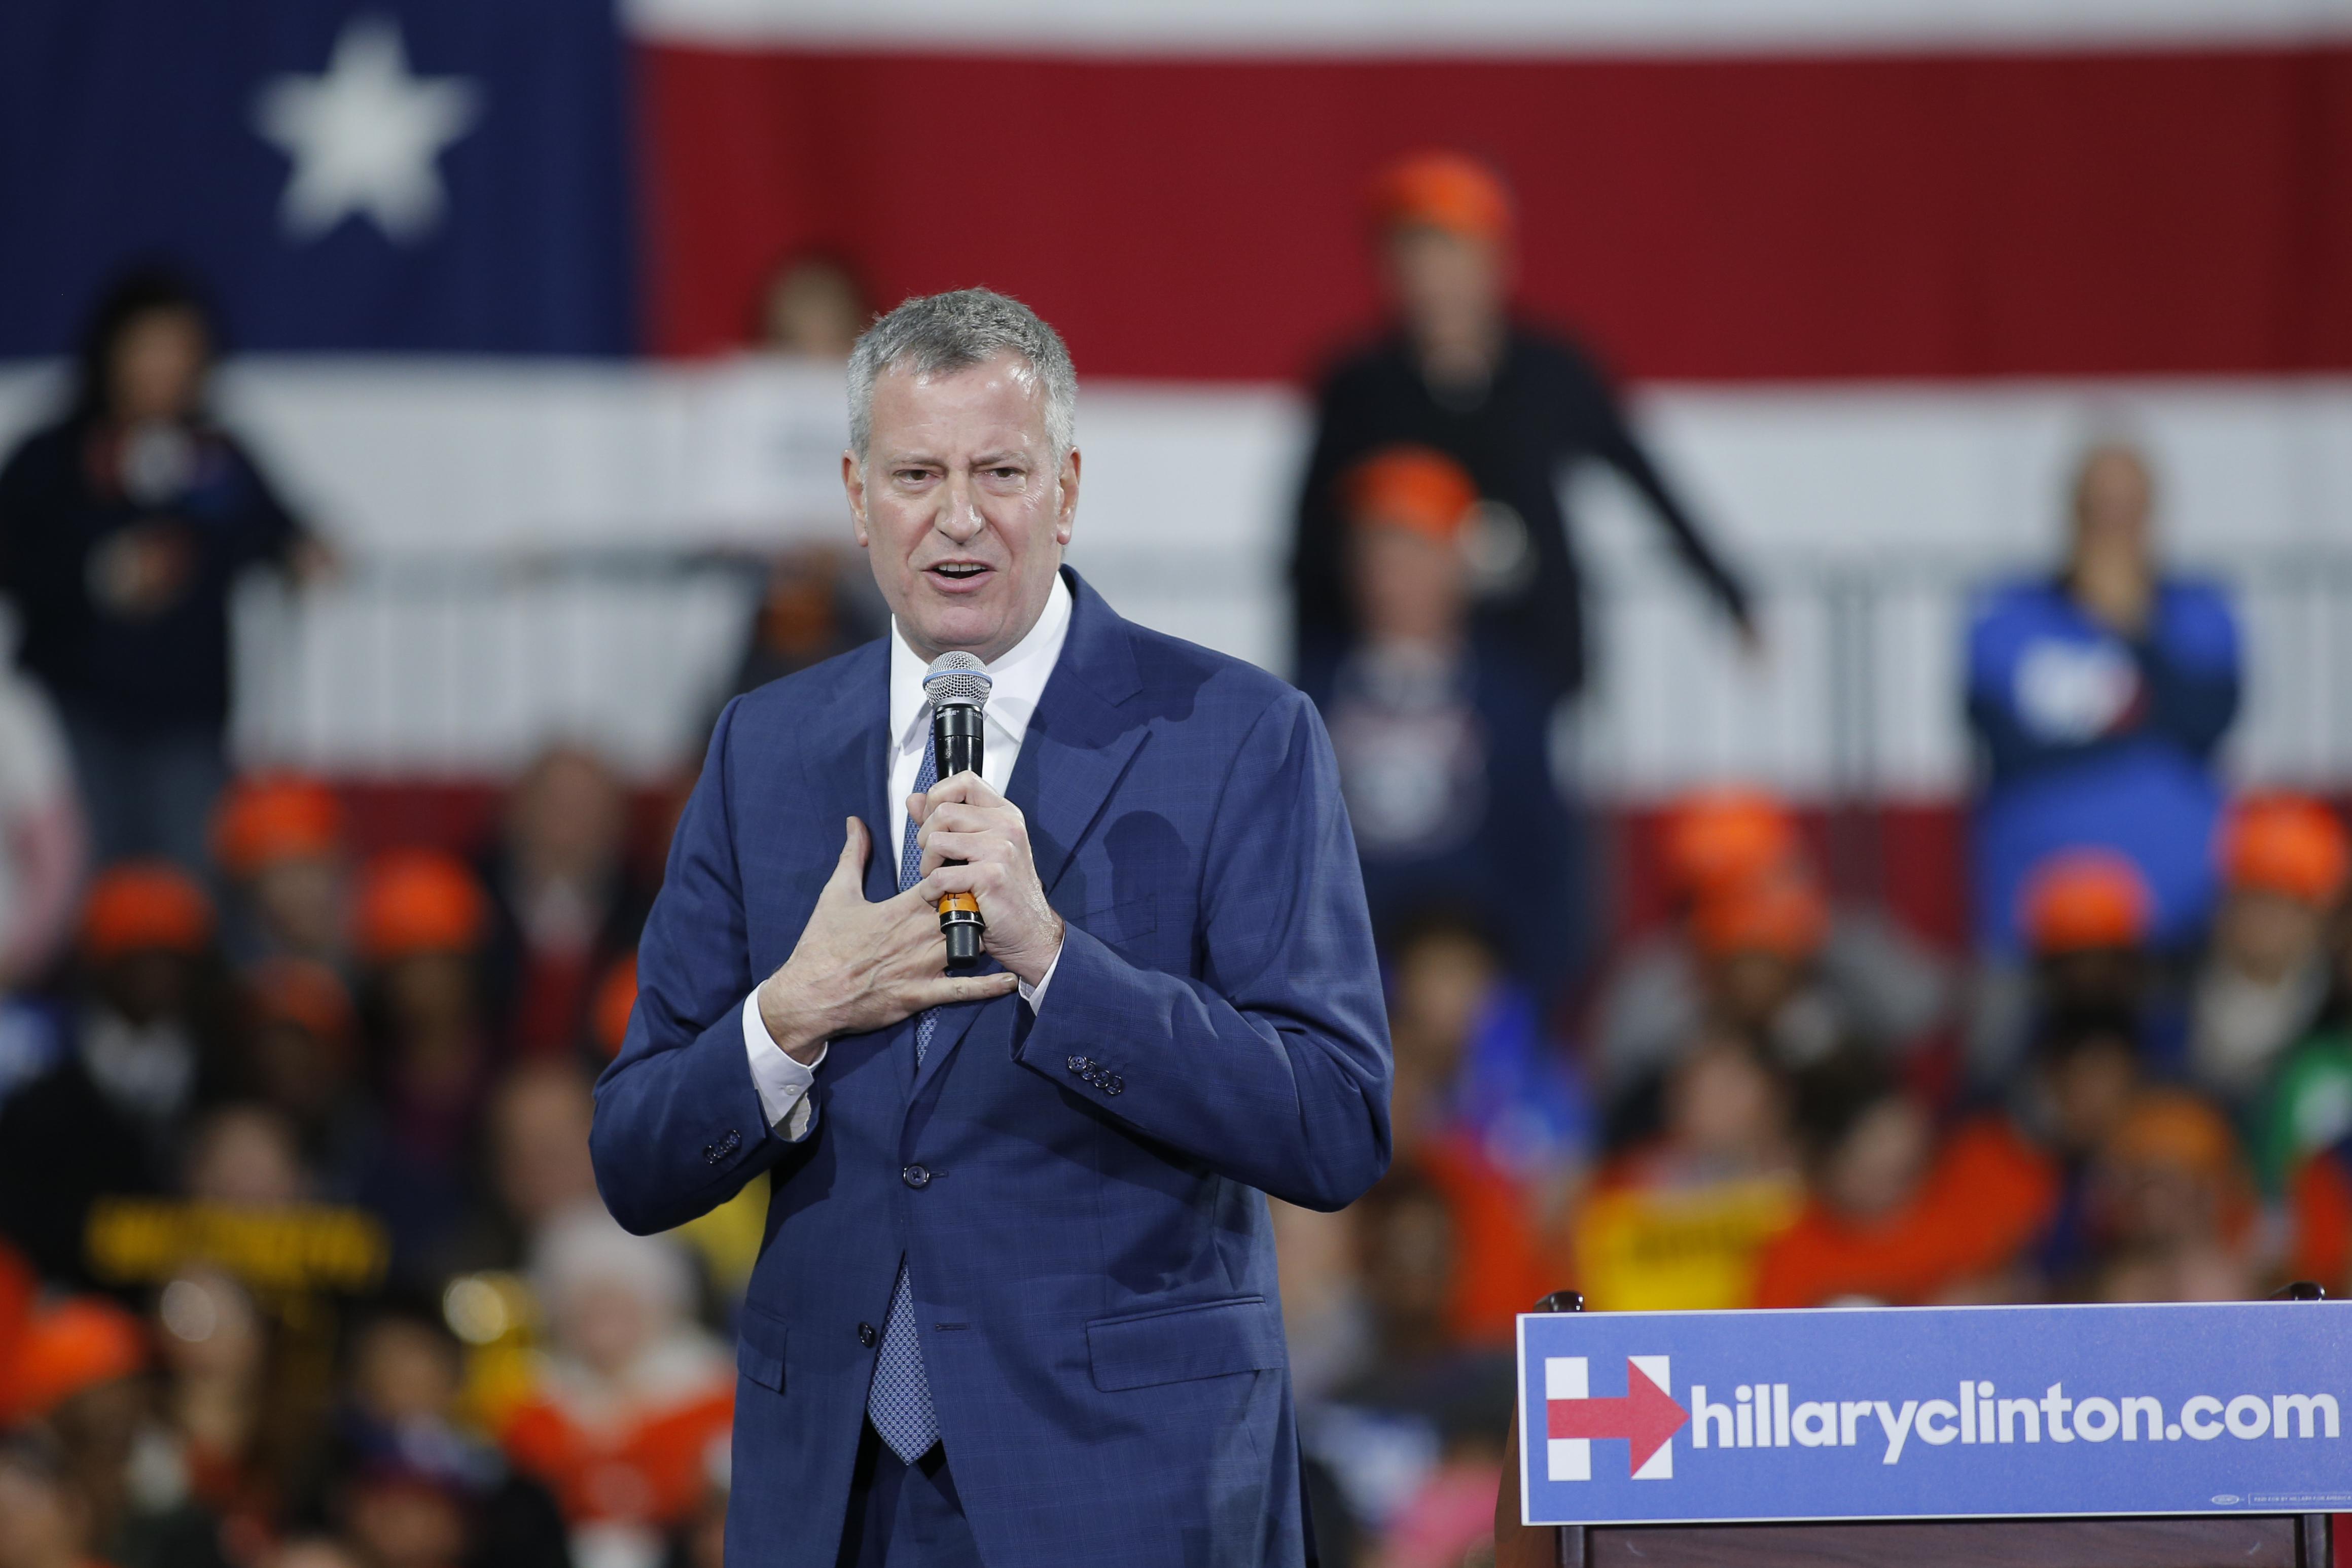 Mayor Bill de Blasio at a Hillary Clinton rally this month.